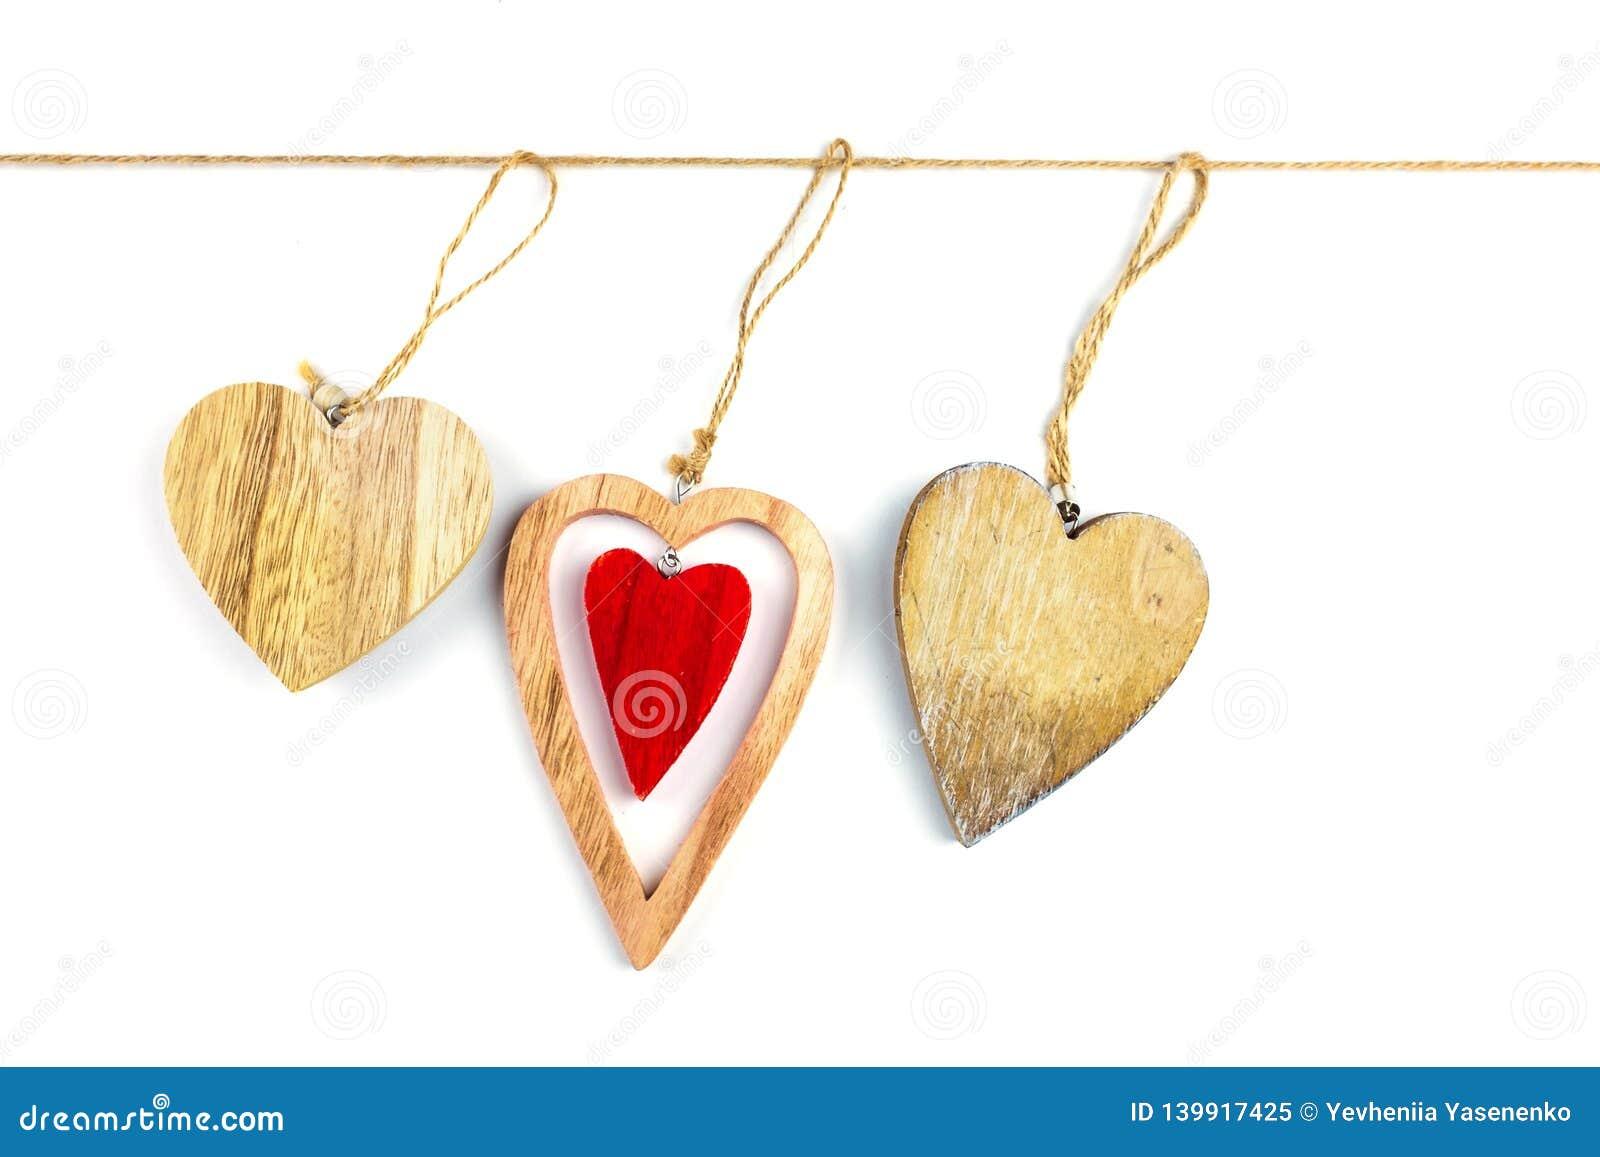 Decorative hearts on wood.